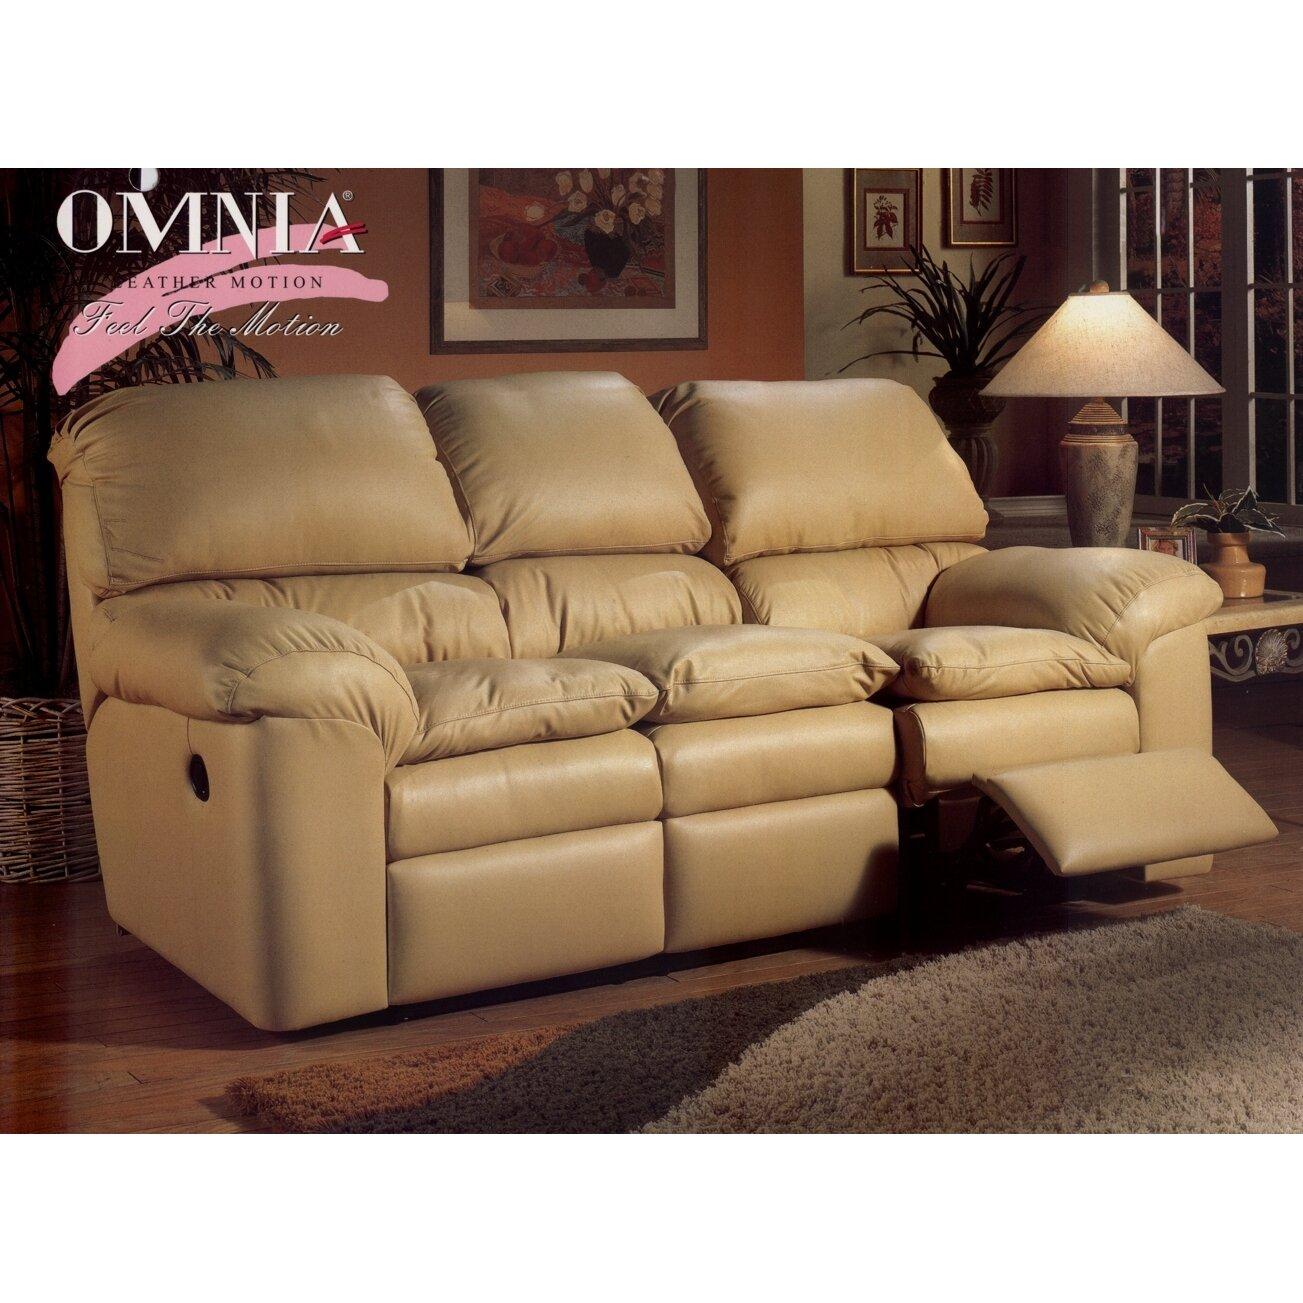 Living Room Furniture: Omnia Leather Cordova Reclining Sofa Living Room Set